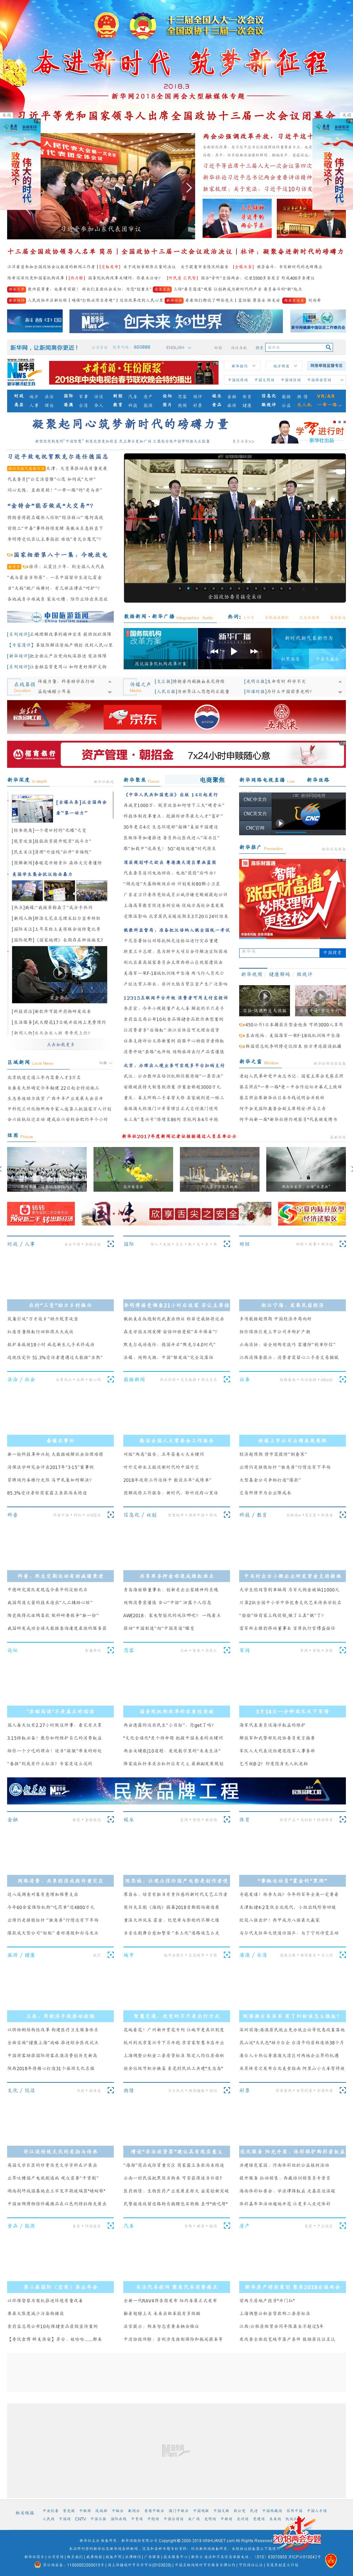 Xinhua at Thursday March 15, 2018, 12:21 p.m. UTC